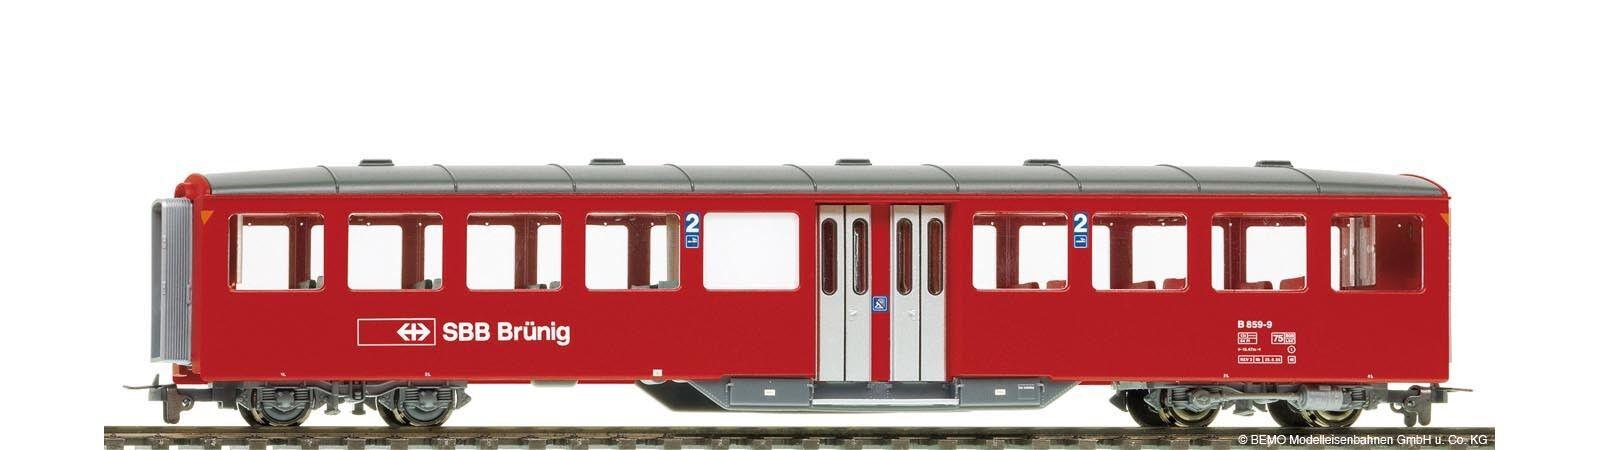 BEMO-h0m - 3257439 carreggiata stretta-Vagoni 2.kl.b859 SBB-Brünig rosso un tempo medio